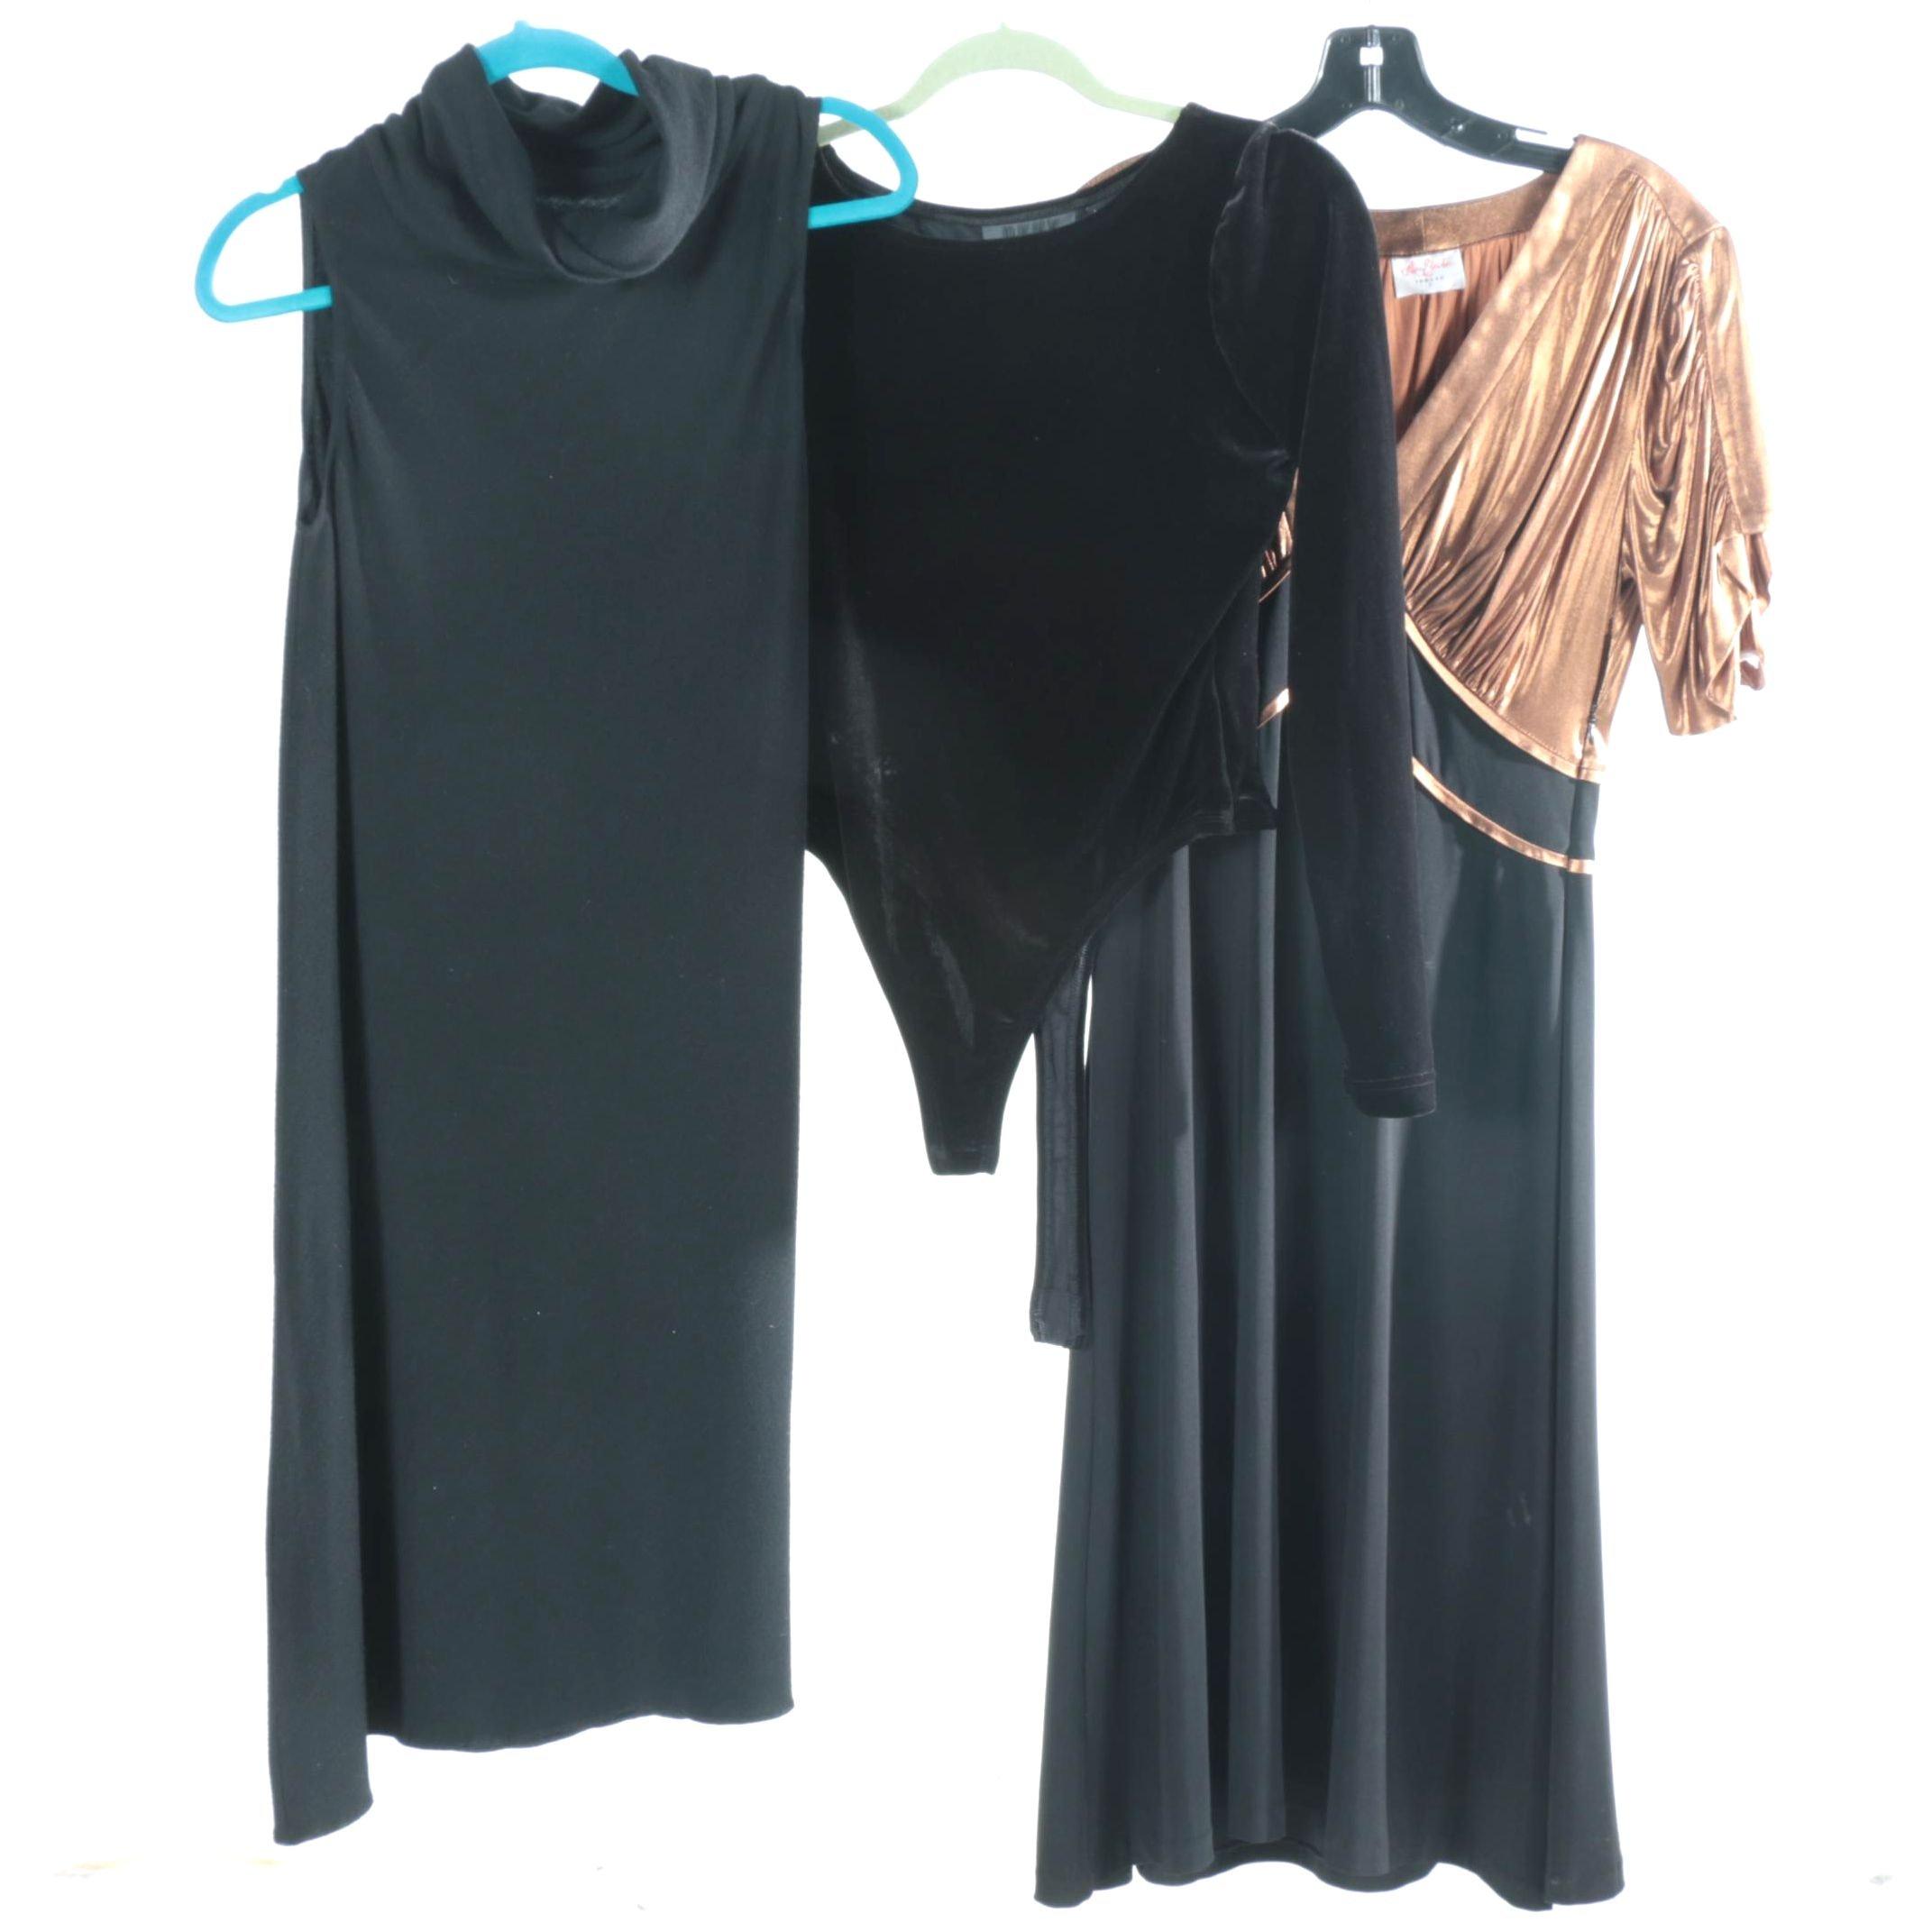 Dresses and DKNY Bodysuit Including Leona Edmiston